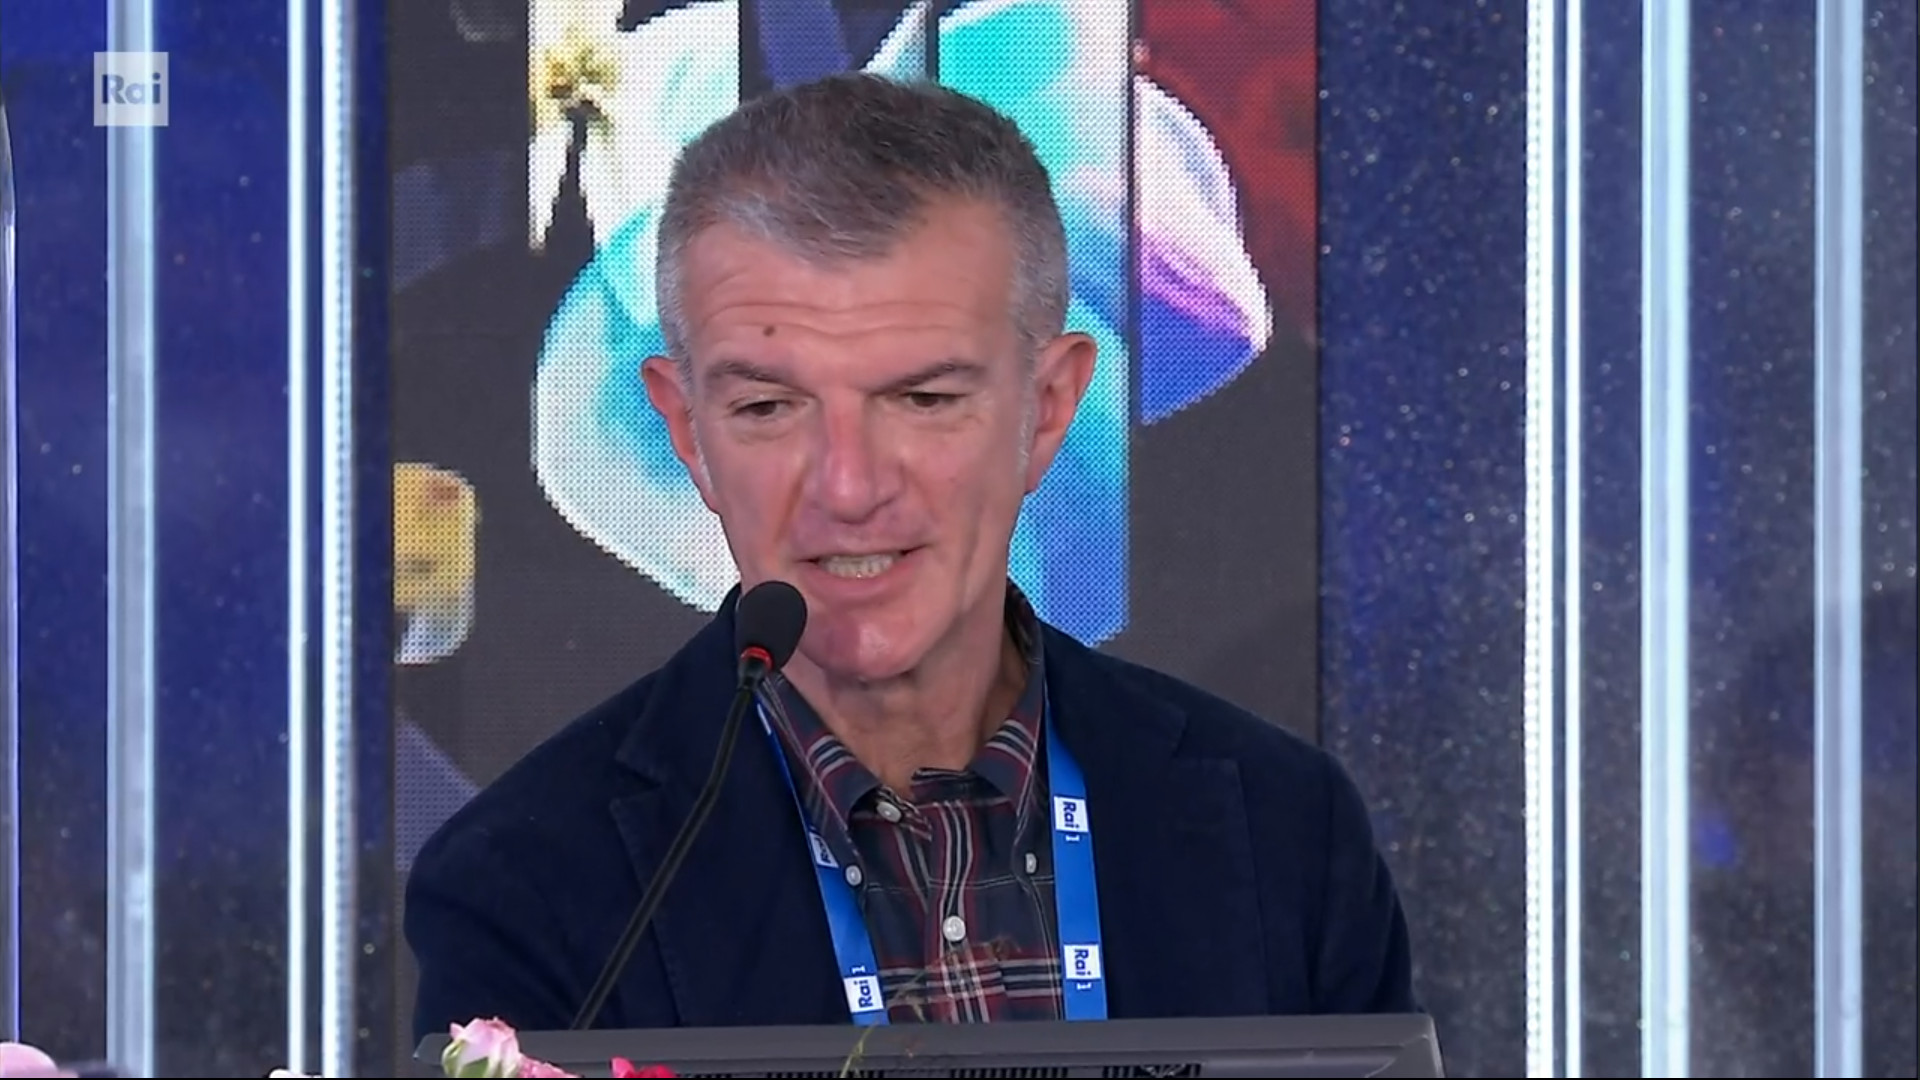 Sanremo 2021 conferenza stampa 1 marzo